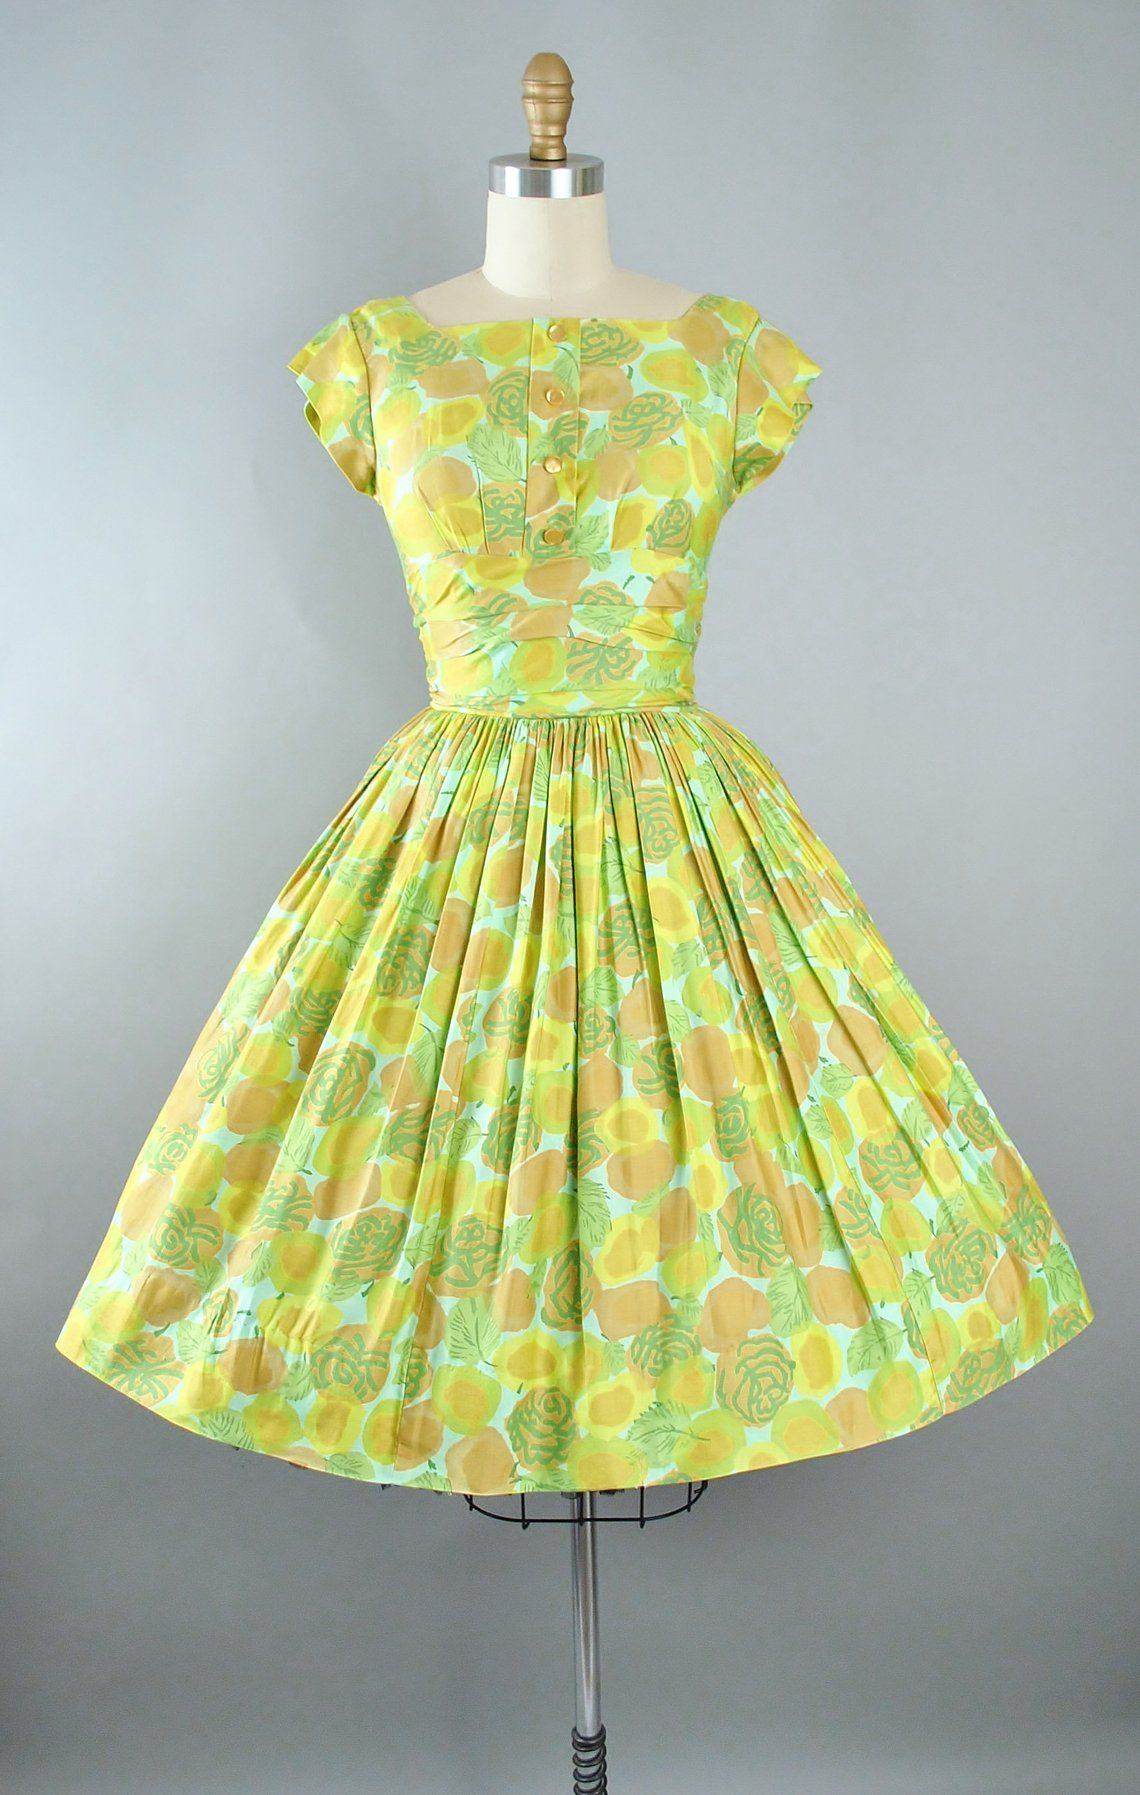 Vintage 50s Dress 1950s Cotton Sundress Green Floral Leaf Flower Swirl Print Full Swing Skirt Rockabilly Pinup Garden Picnic Party Xs Vintage Dresses 50s Dresses Vintage Dresses Online [ 1795 x 1140 Pixel ]